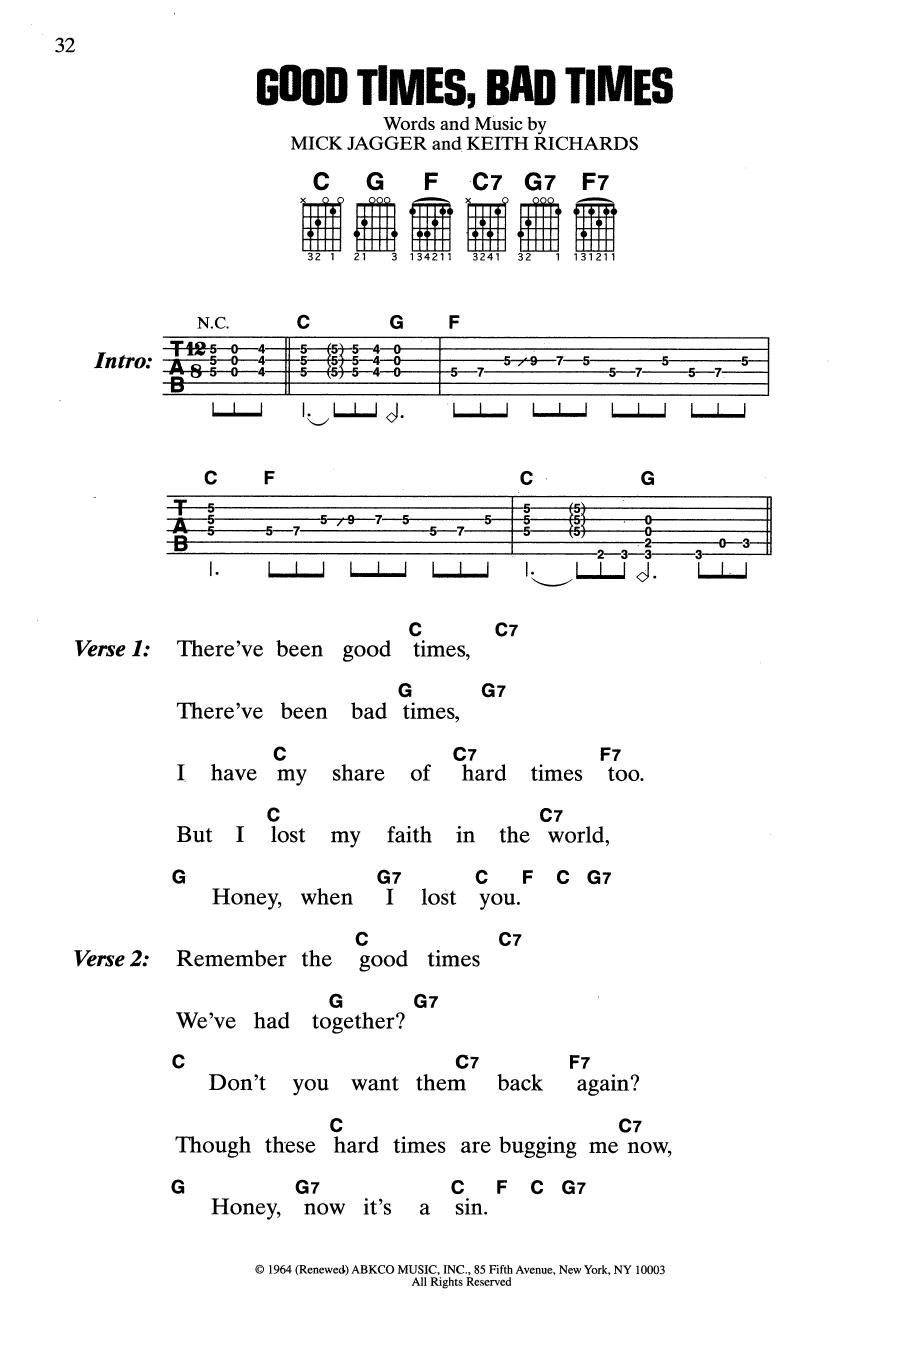 Good Times, Bad Times (Guitar Chords/Lyrics)